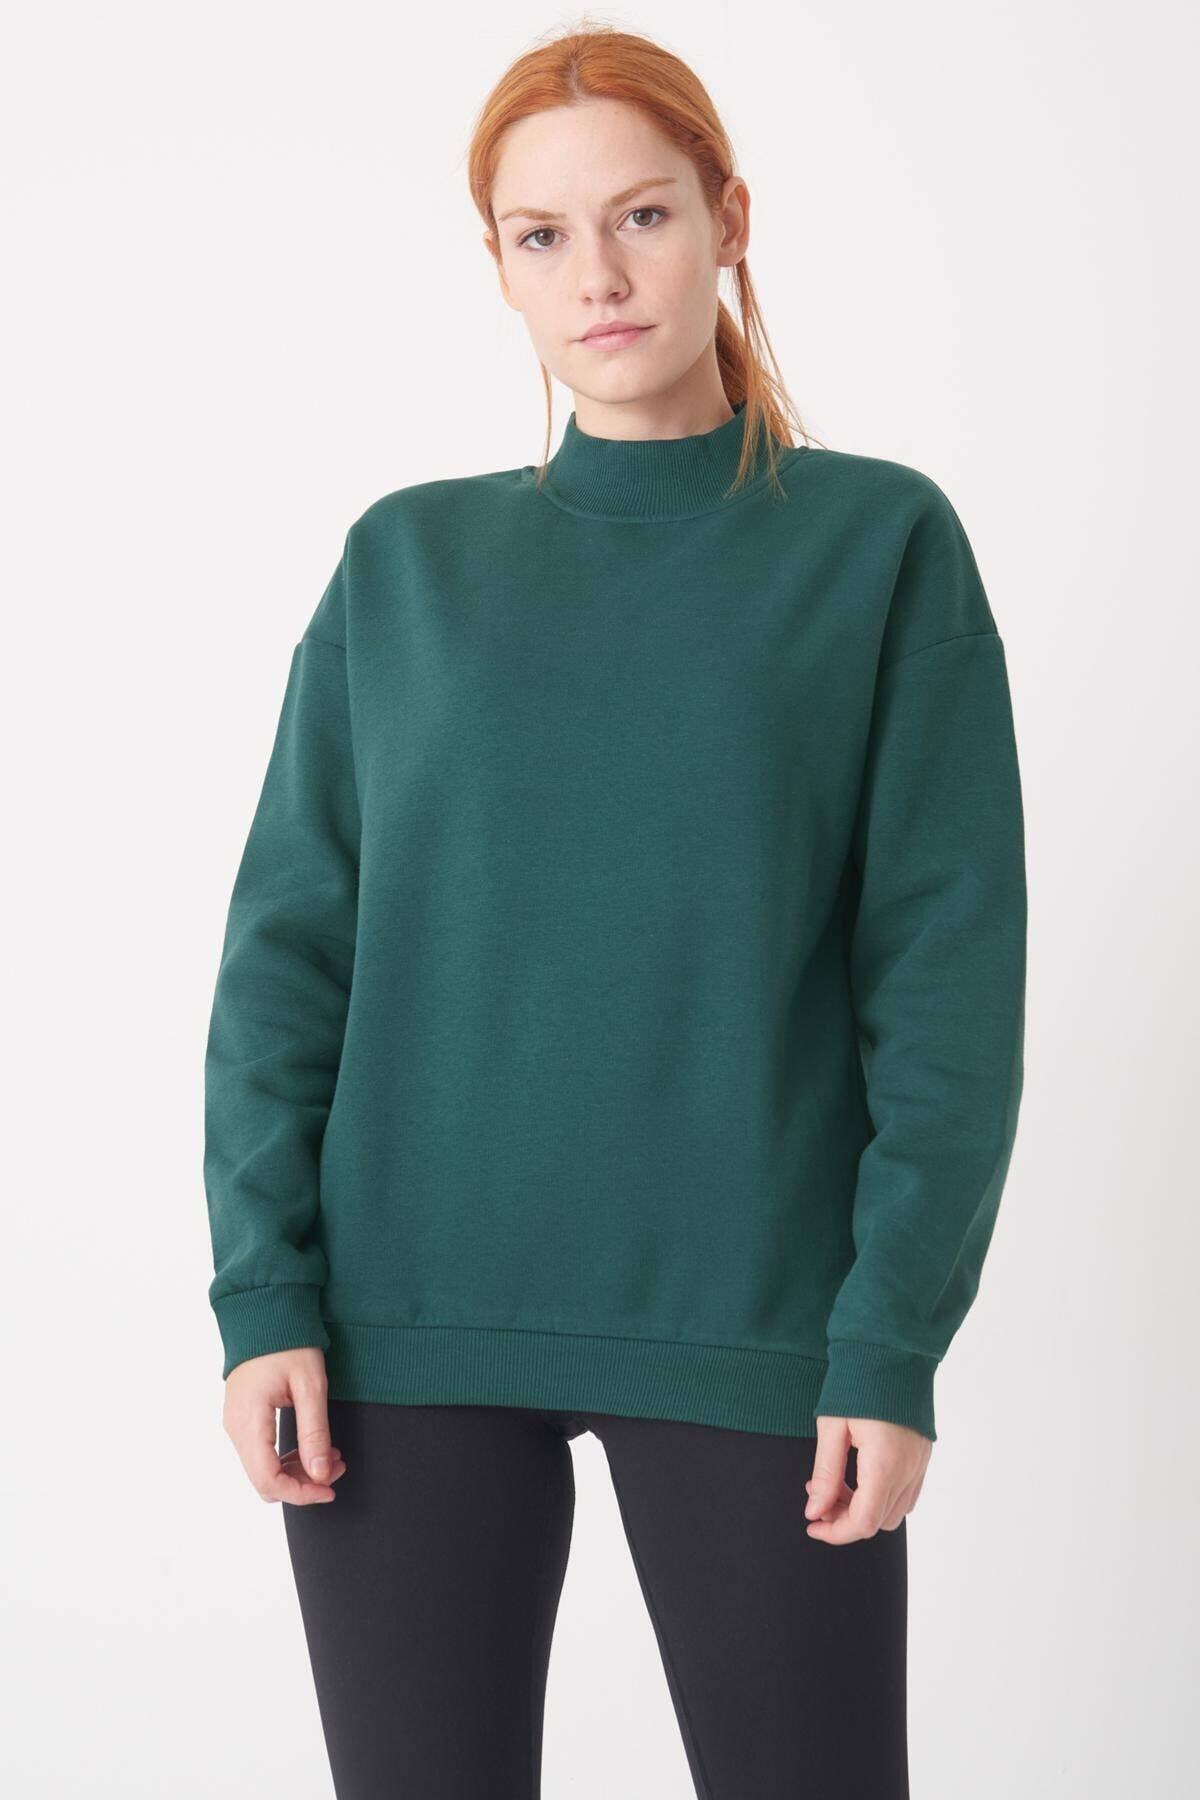 Addax Kadın Koyu Yeşil Yarım Balıkçı Yaka Sweat S8606 - I4 - I5 ADX-0000019754 2